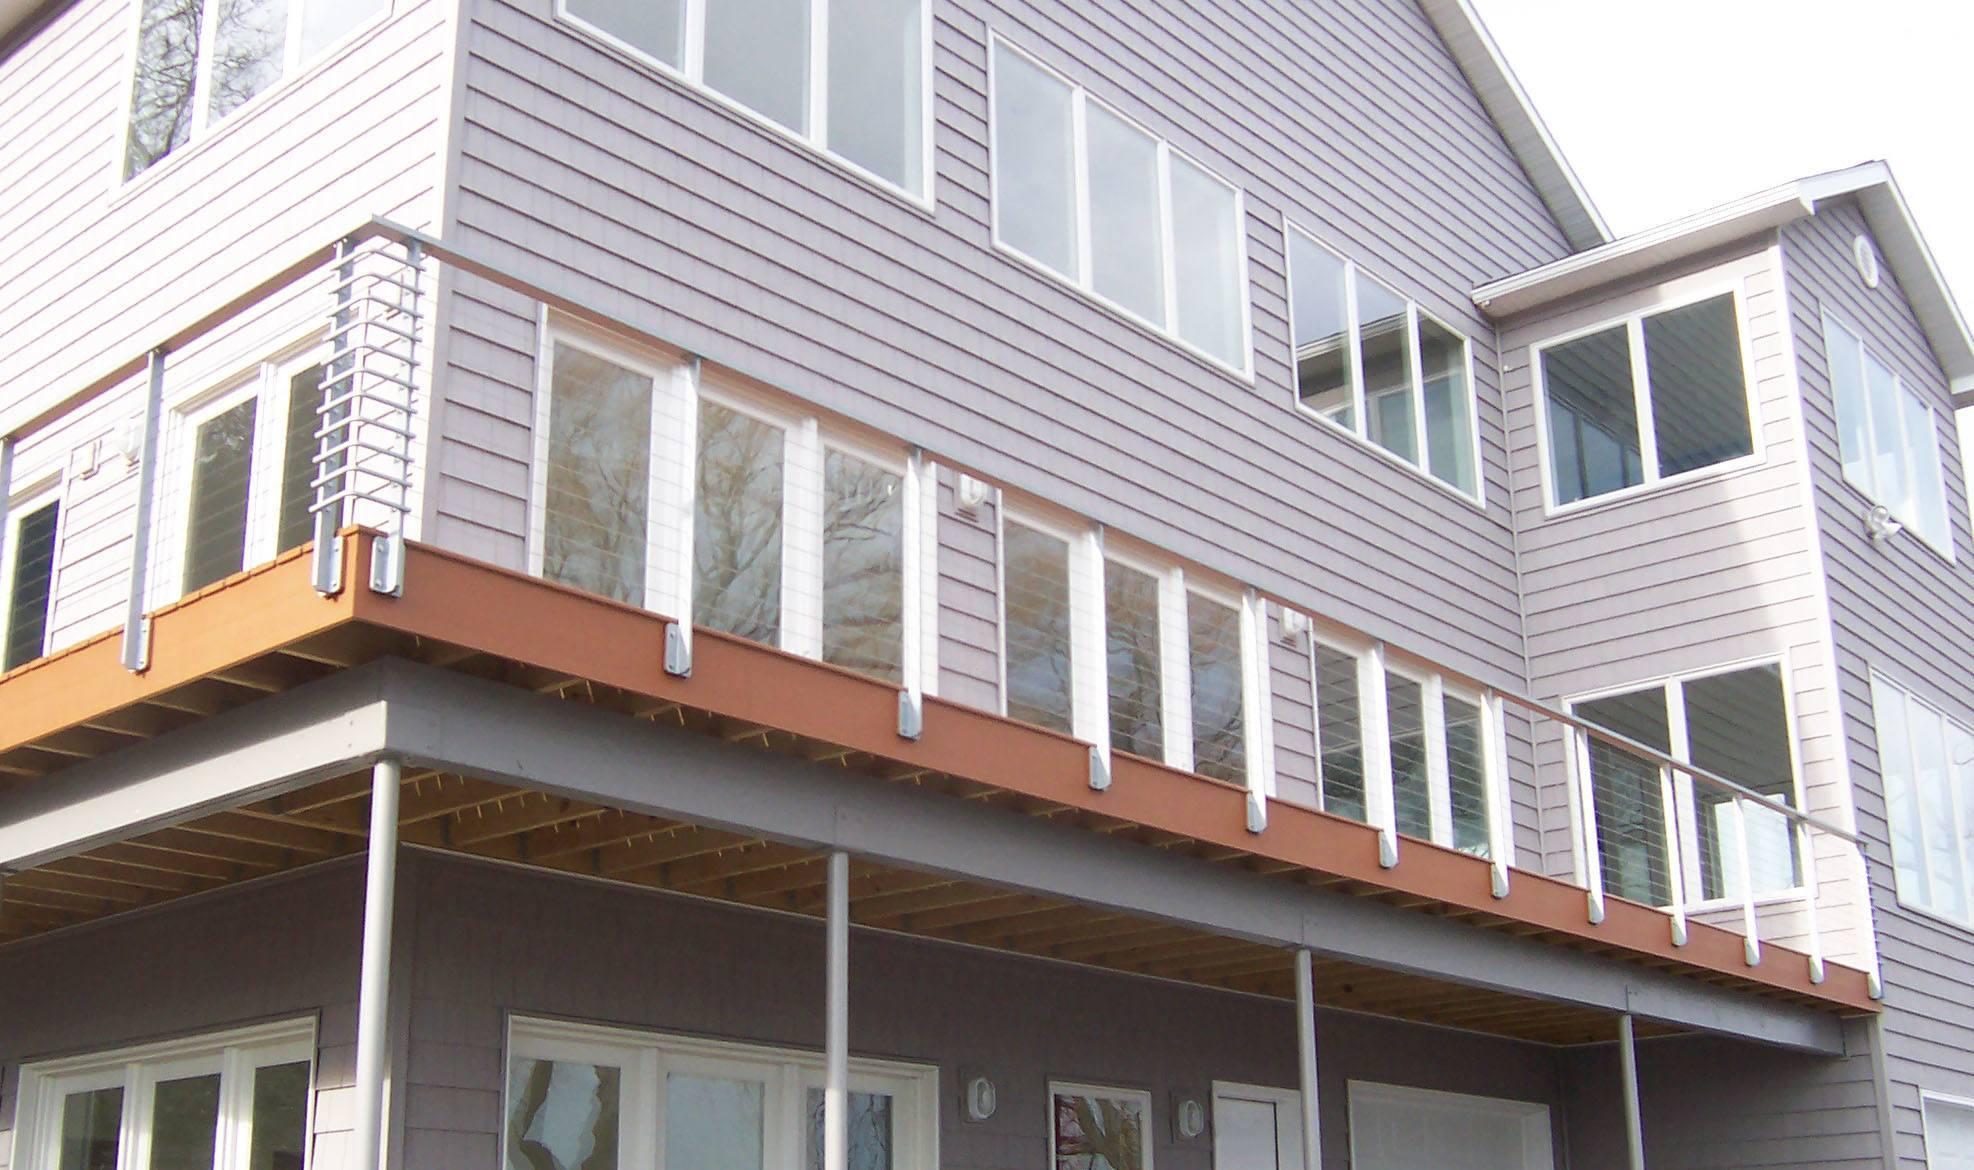 Deck railing Tokyo Style